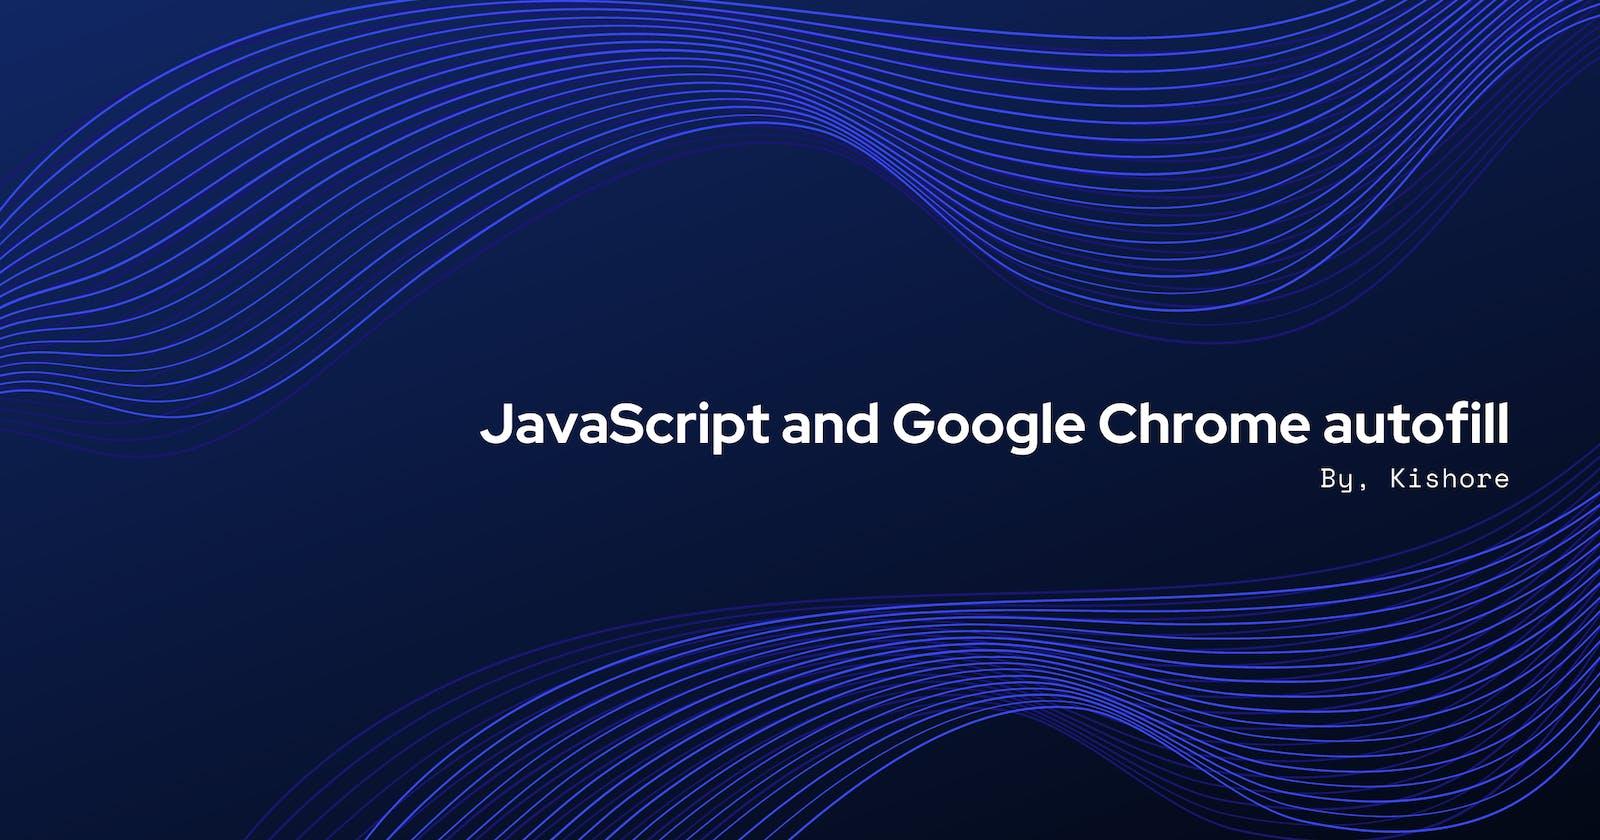 JavaScript and Google Chrome autofill